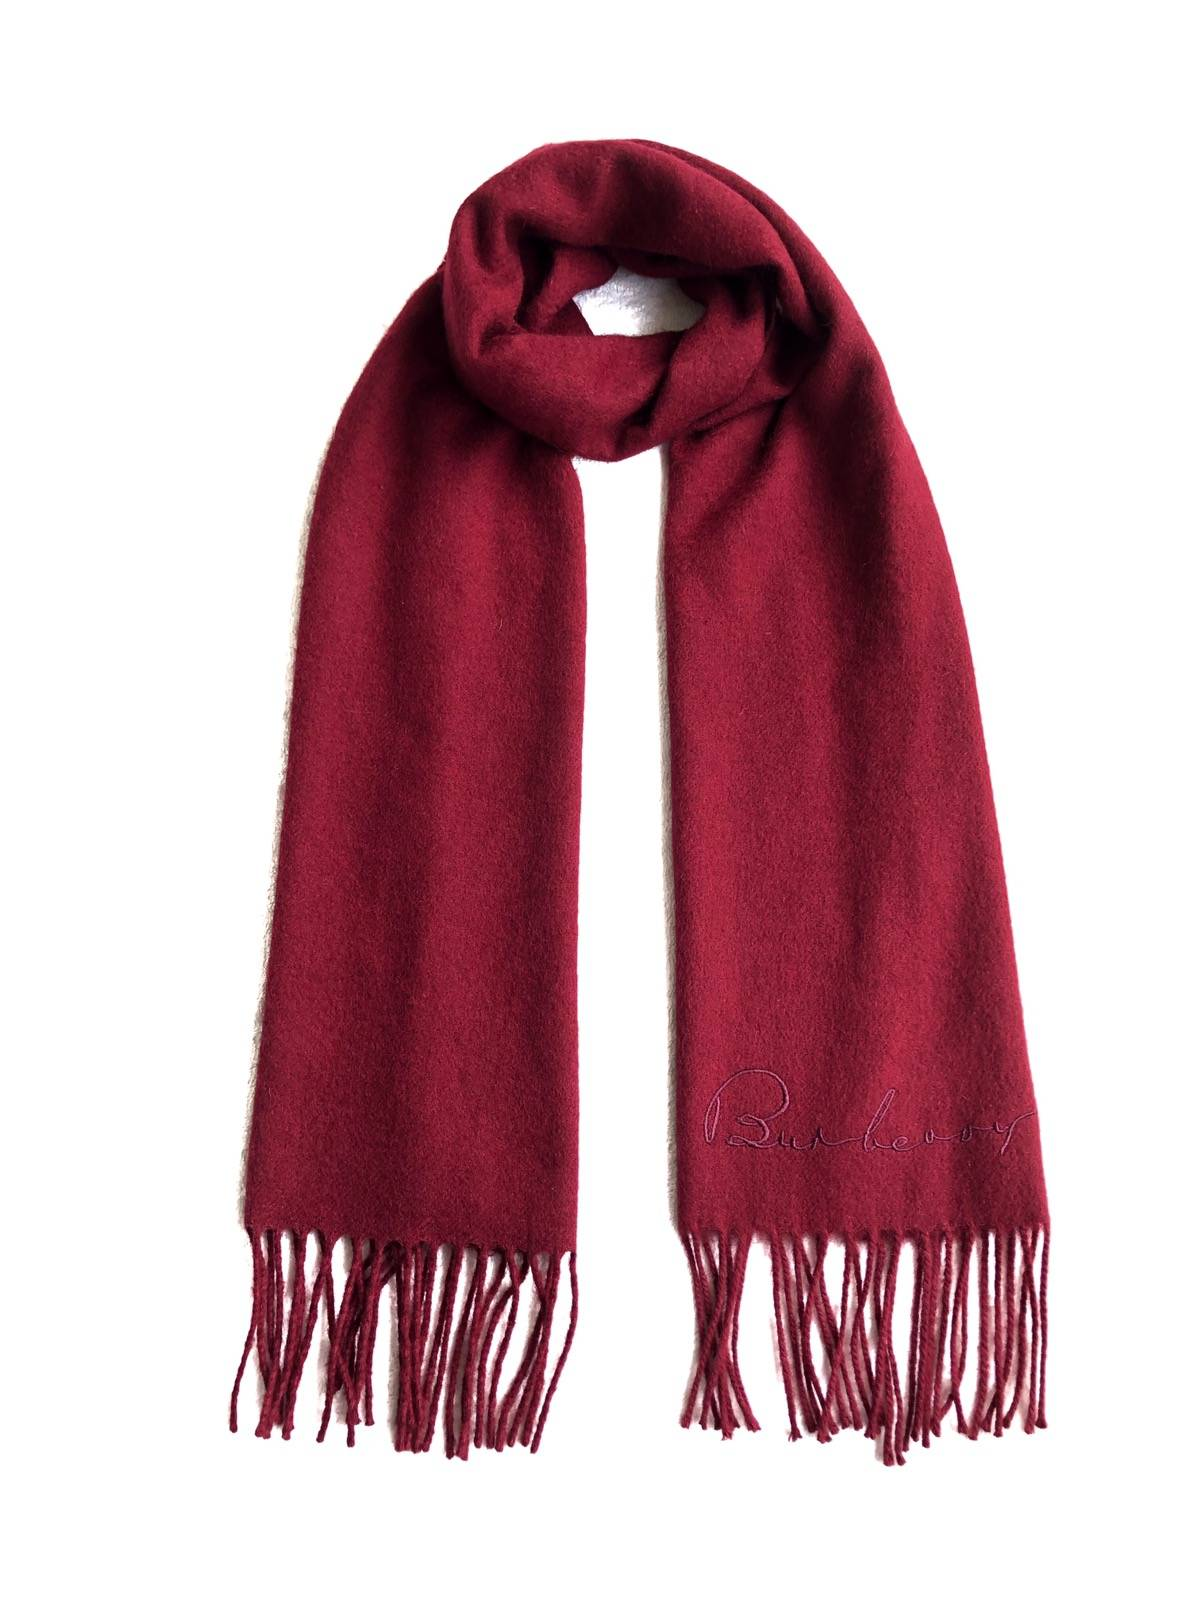 Burberry Burberry Plain Cashmere Scarves Muffler Grailed